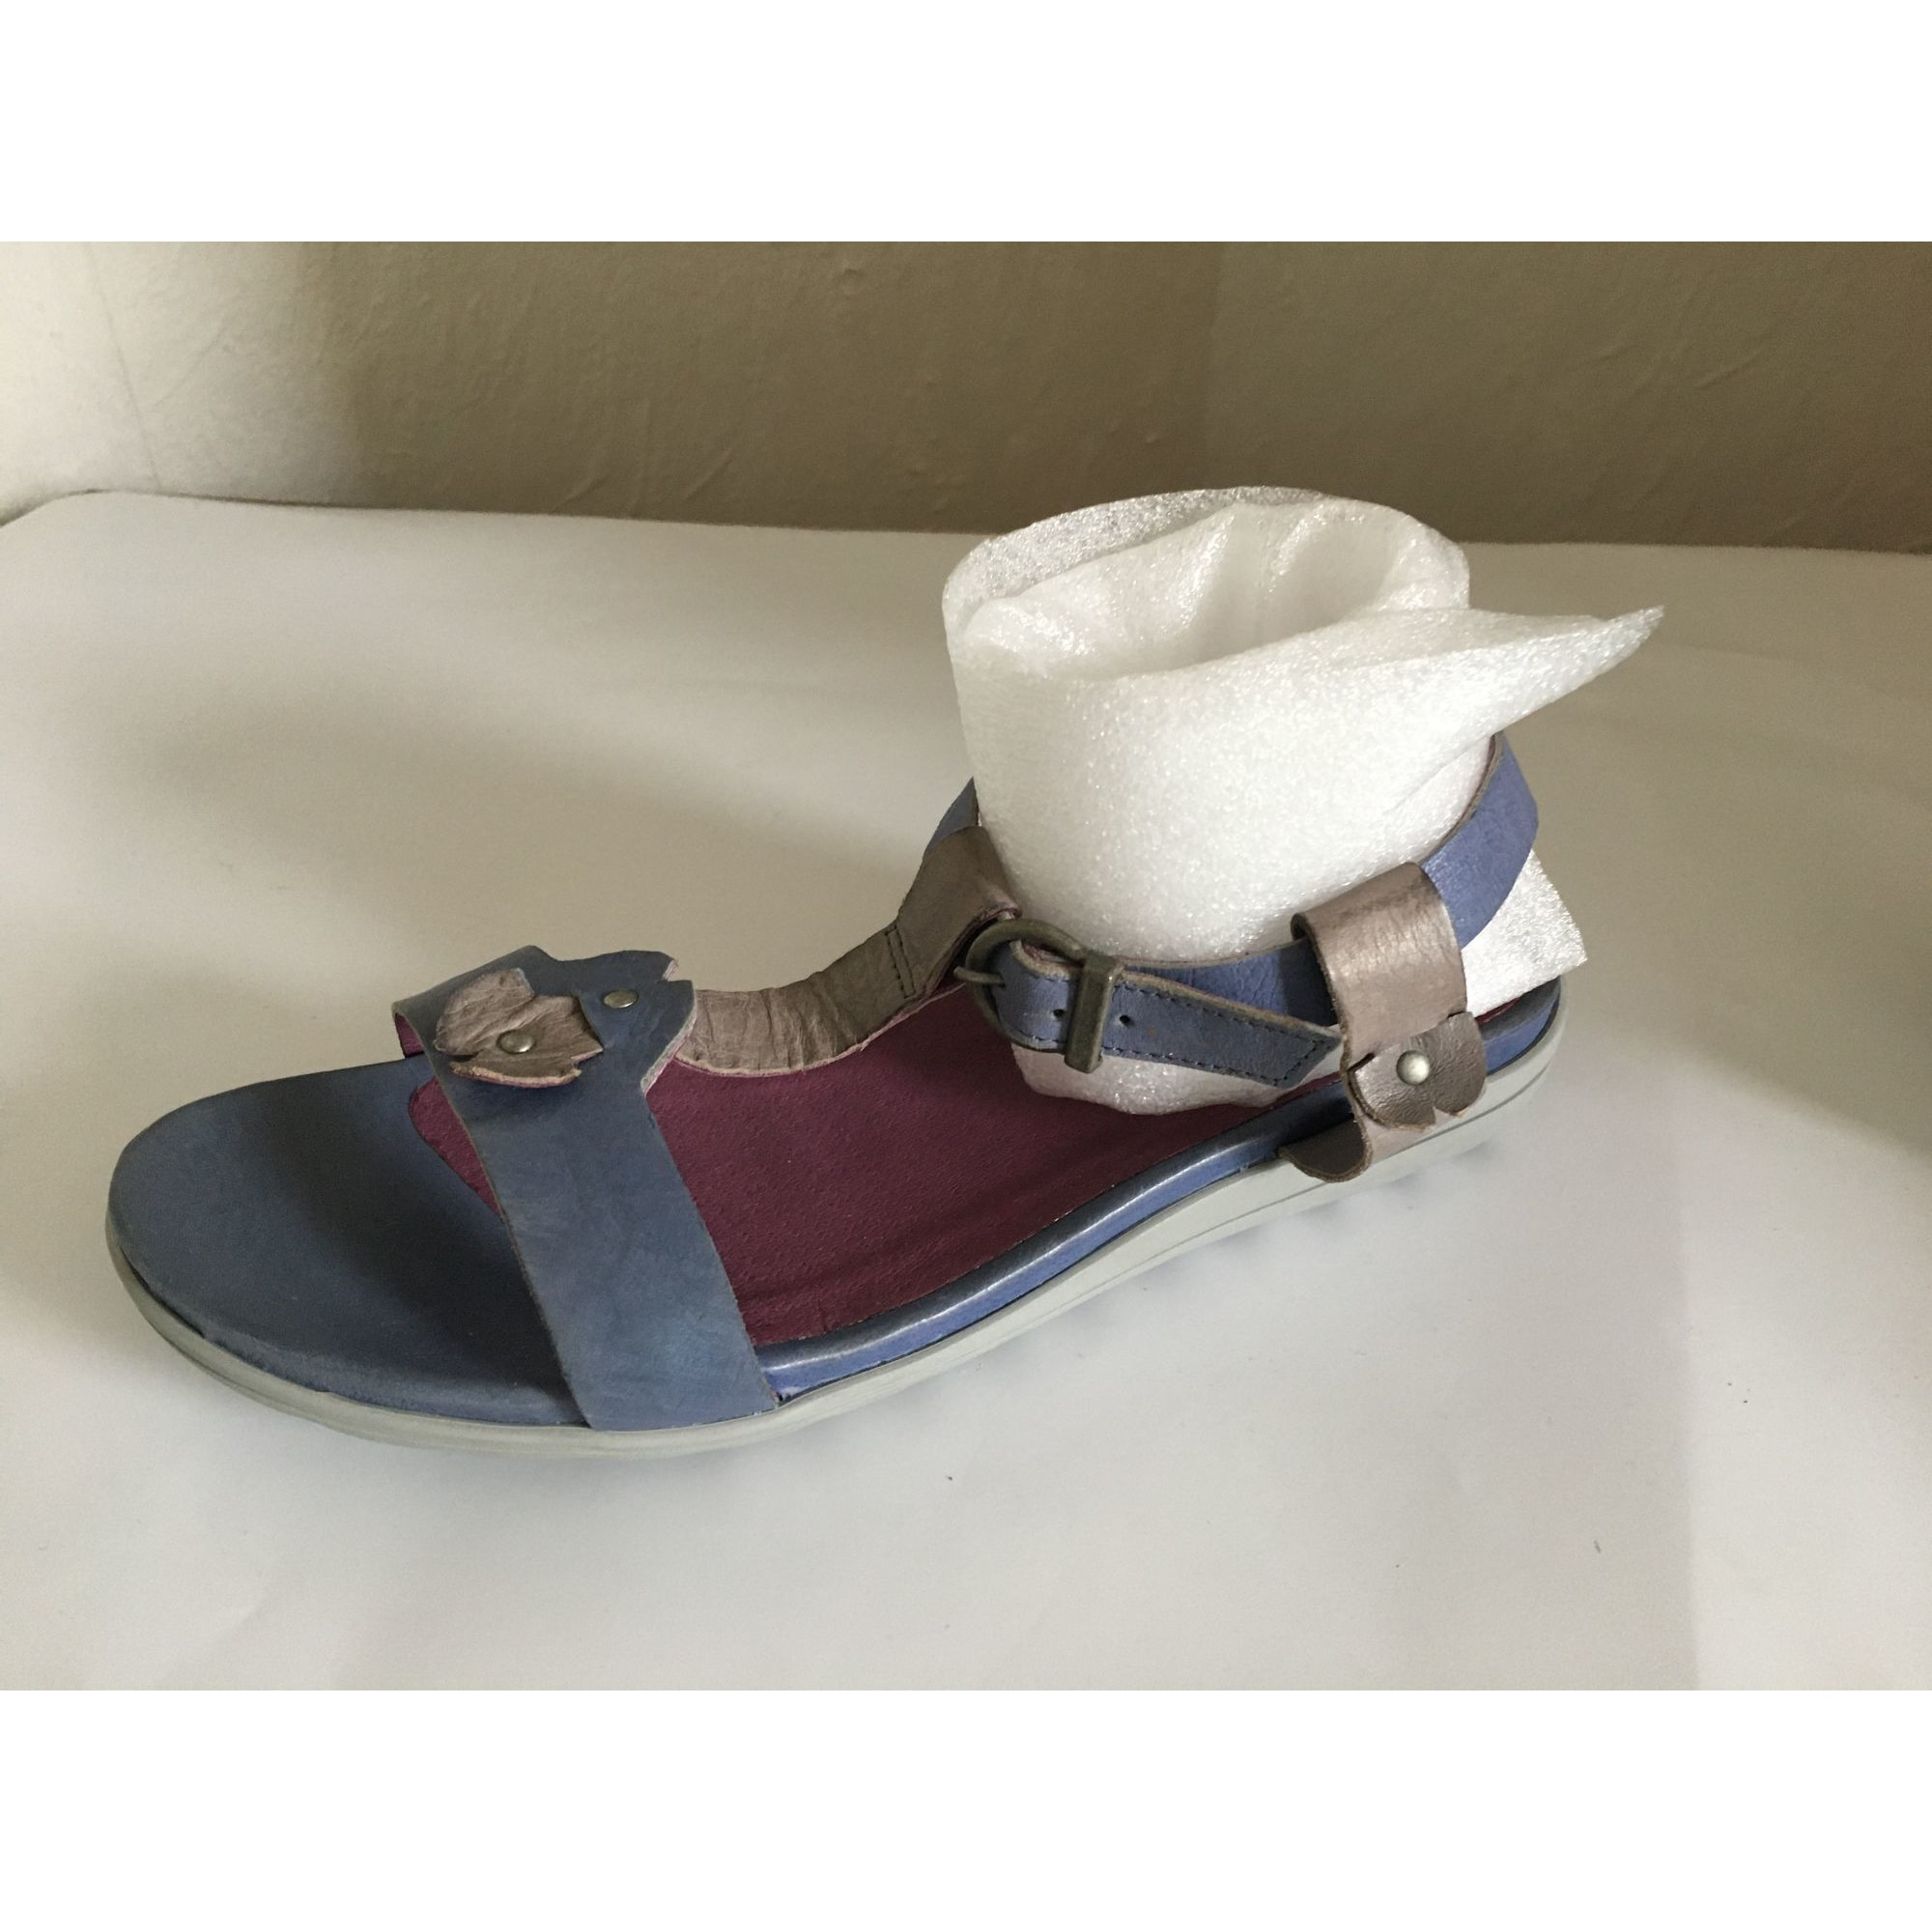 Sandales plates  STÉPHANE GONTARD Bleu, bleu marine, bleu turquoise